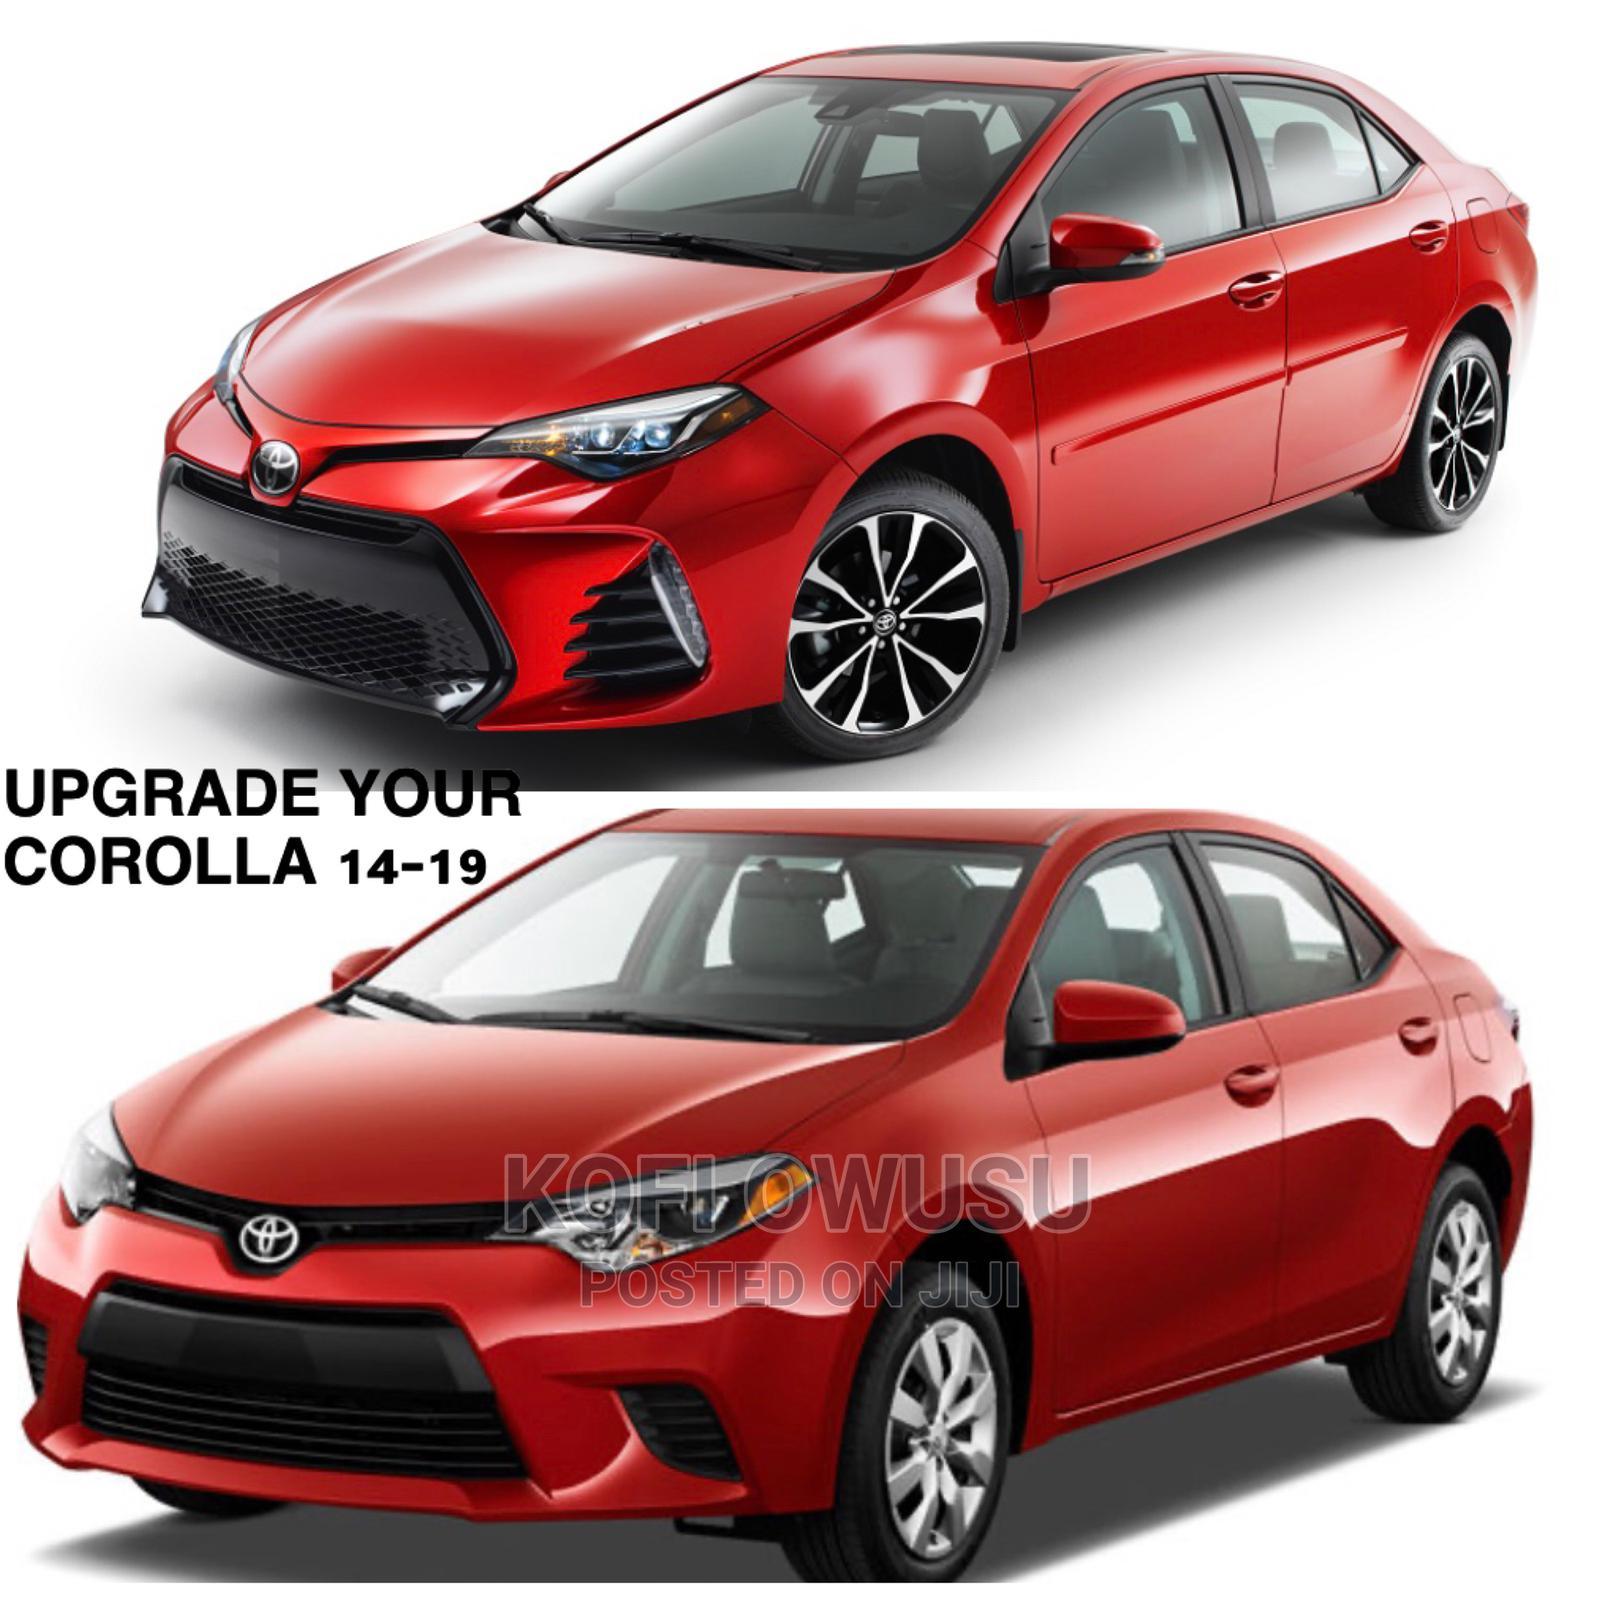 Toyota Corolla 2014,15 -2019 Upgrade